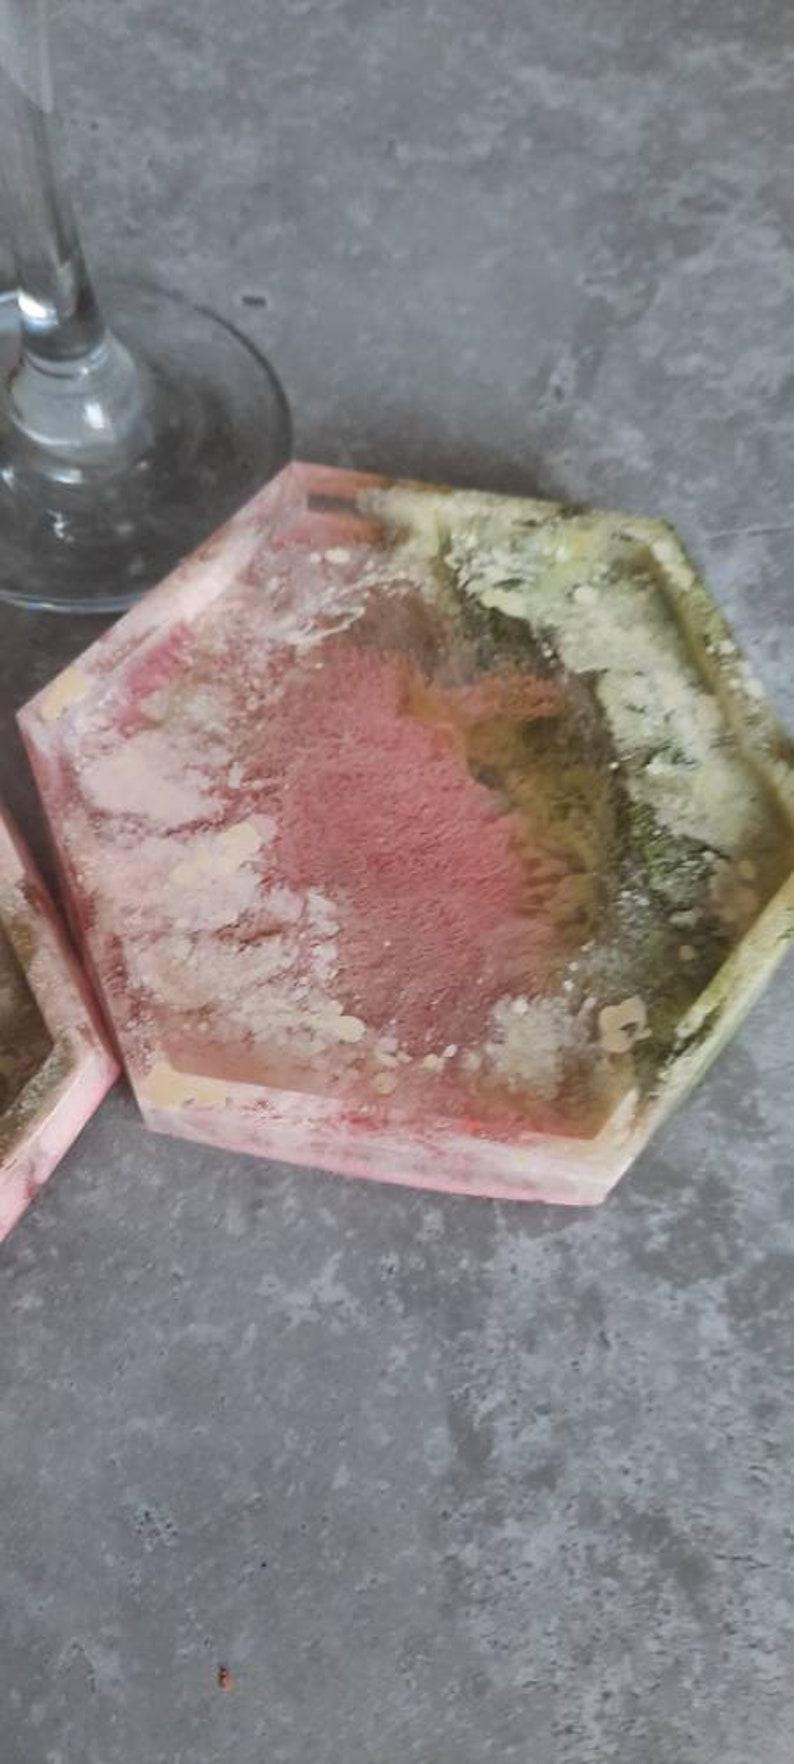 resin petri coaster,alcohol ink coaster,resin coaster,resin tray,GRADE B coaster,hexagonal pink peach resin coaster,resin candle holder,